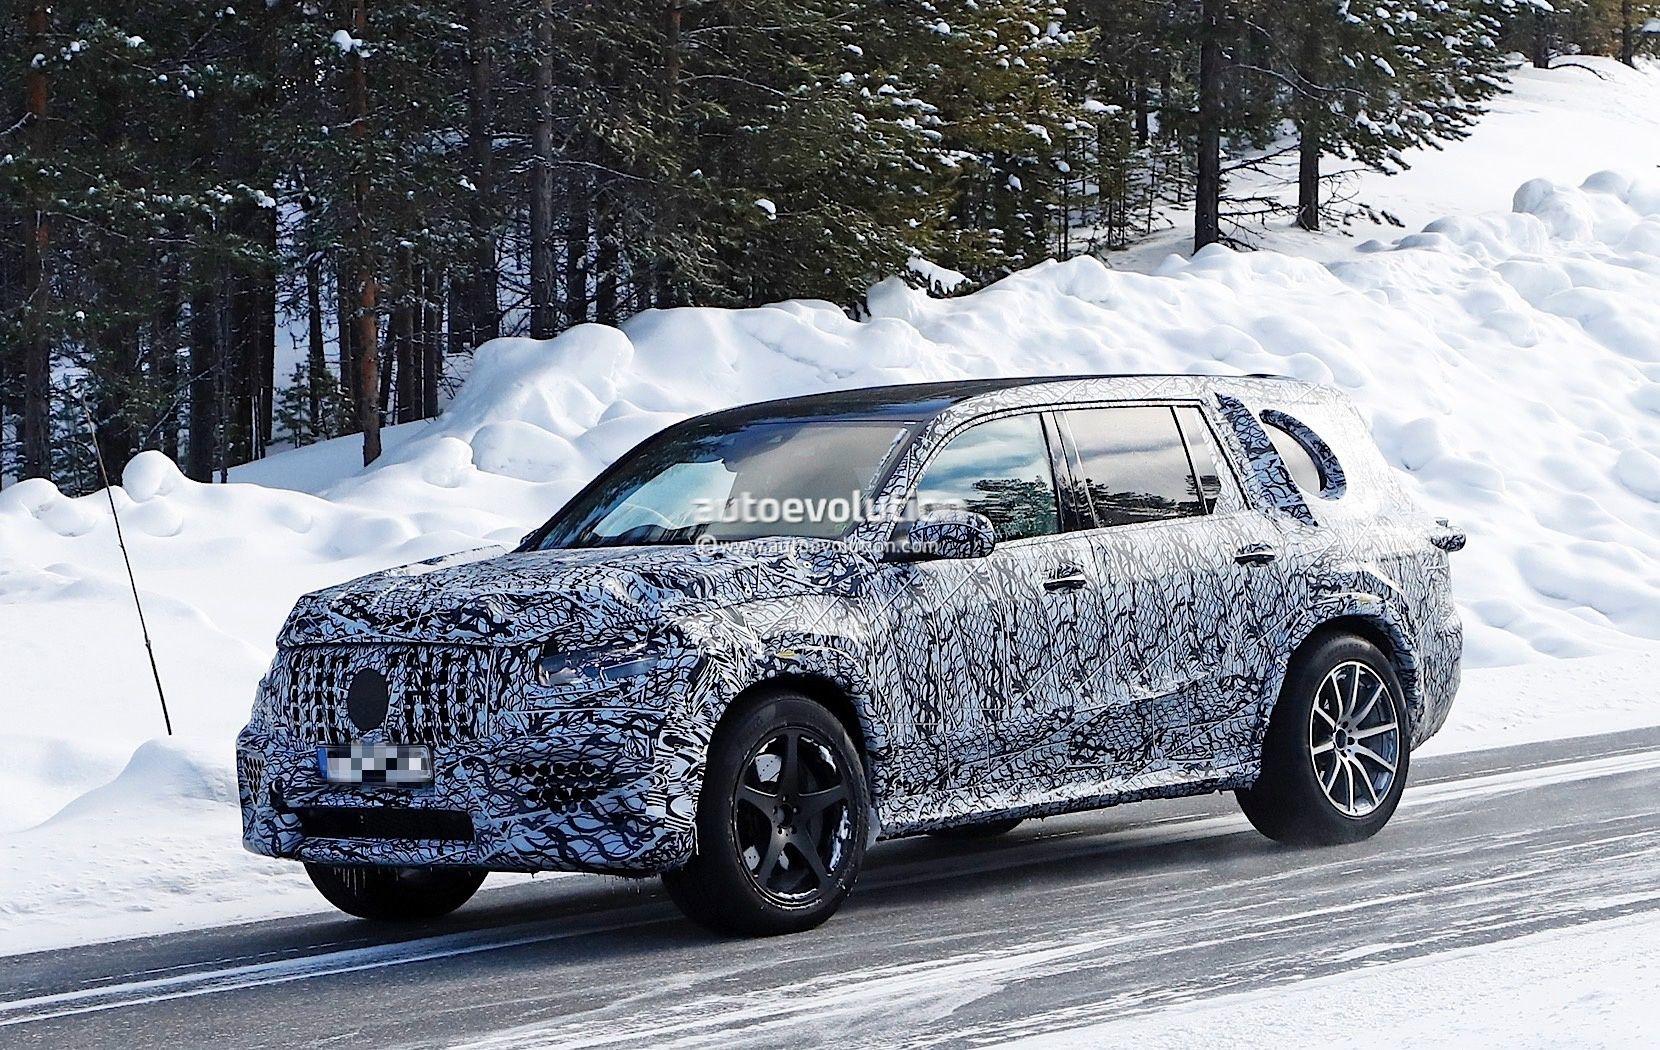 Spyshots 2020 Mercedes Amg Gls 63 Prototype Looks Majestic In The